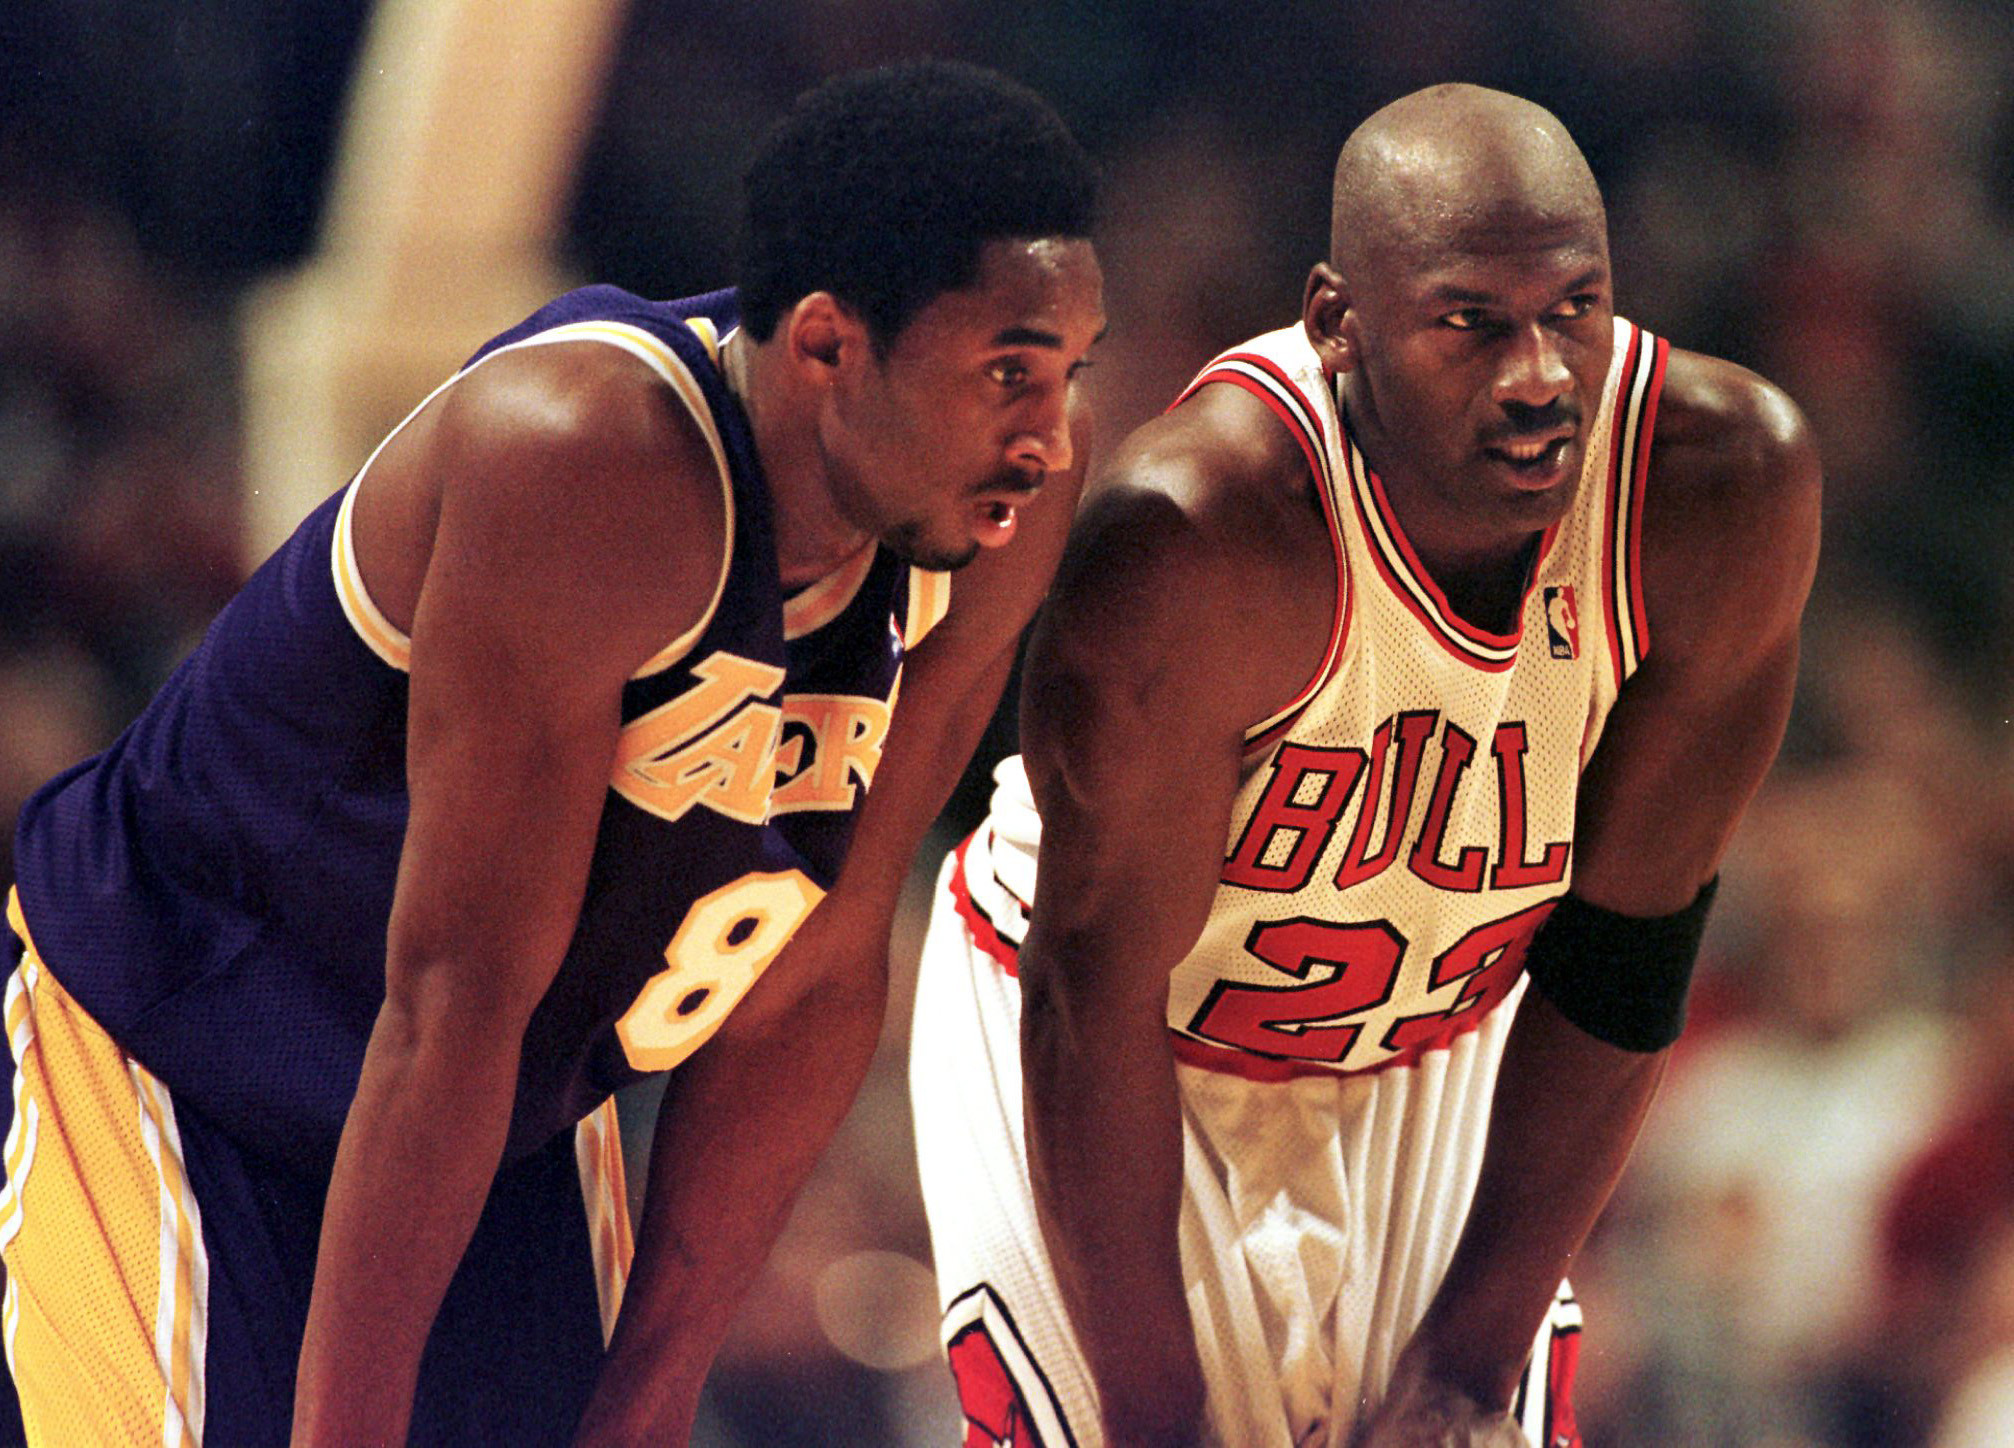 Michael Jordan gifts complete set of Air Jordans to Kobe Bryant